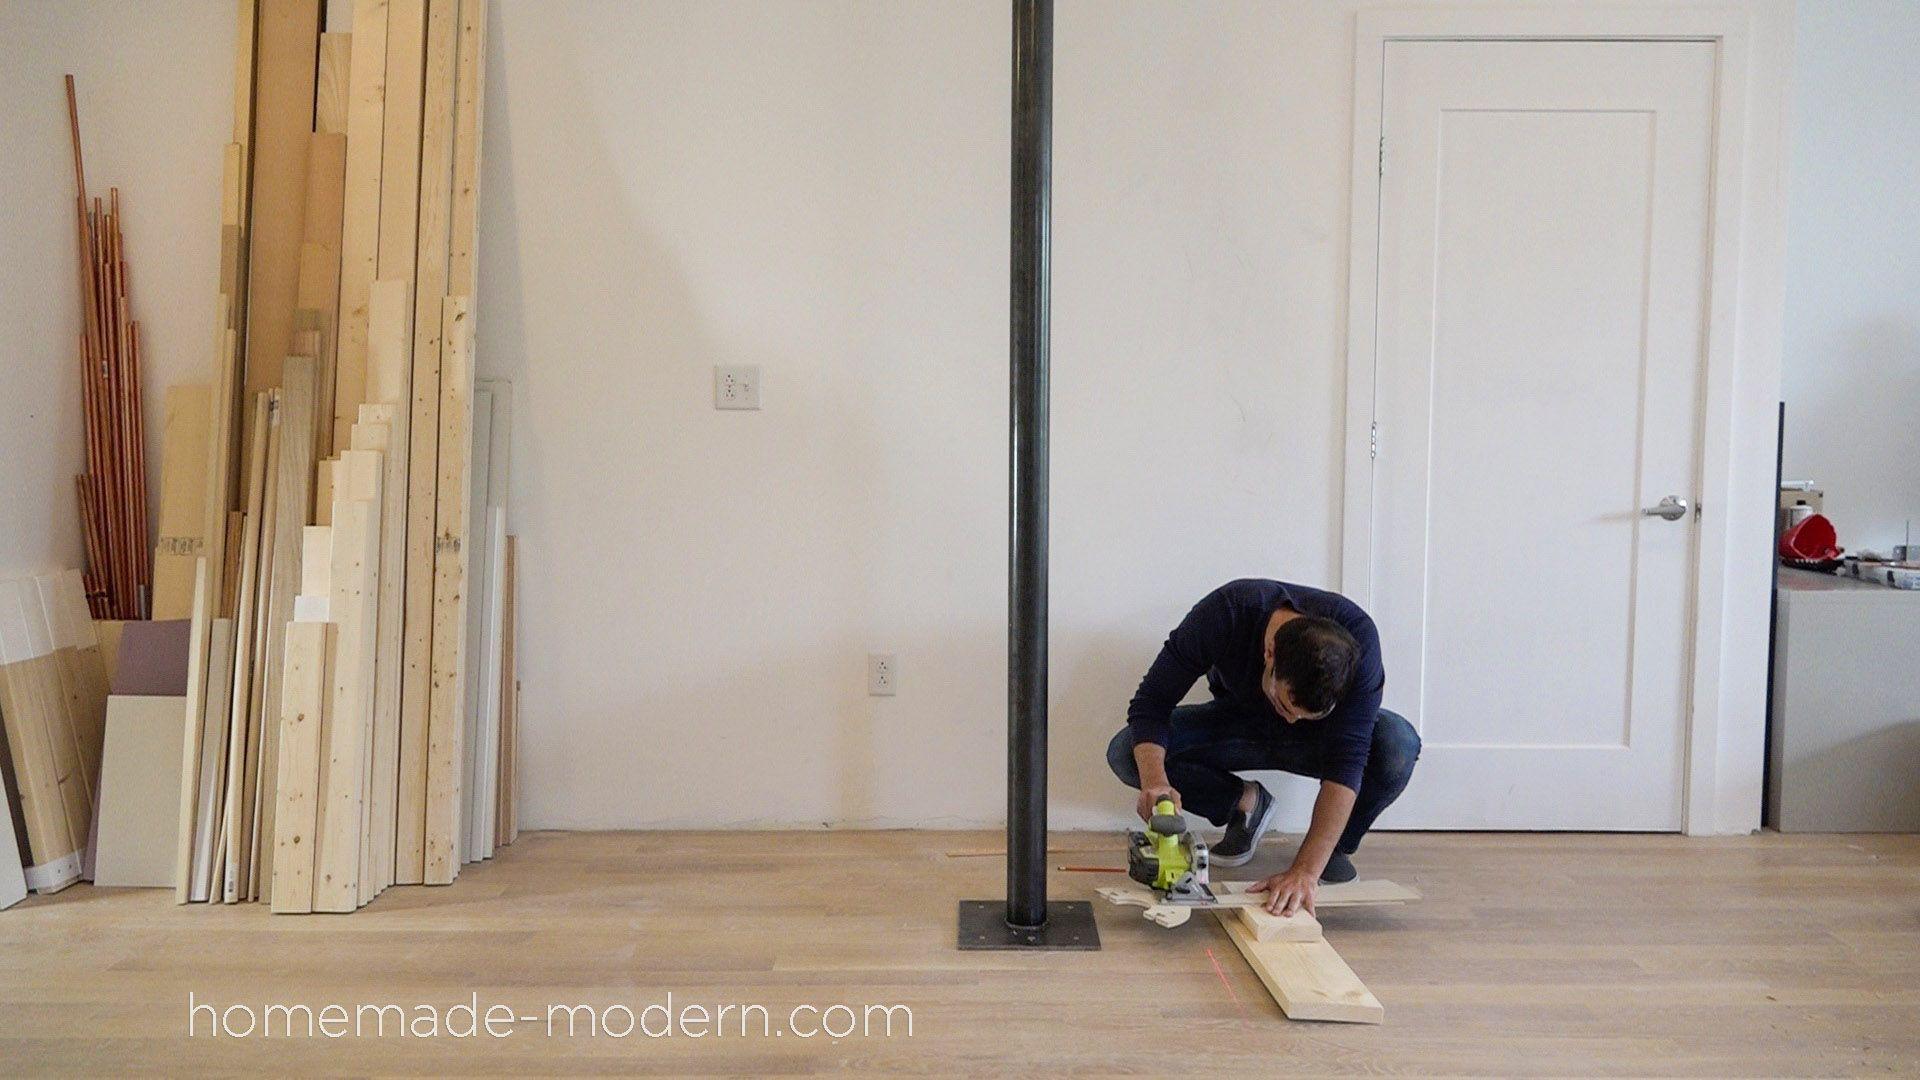 Best Homemade Modern Diy Ep99 Diy Cnc Spiral Staircase С 400 x 300